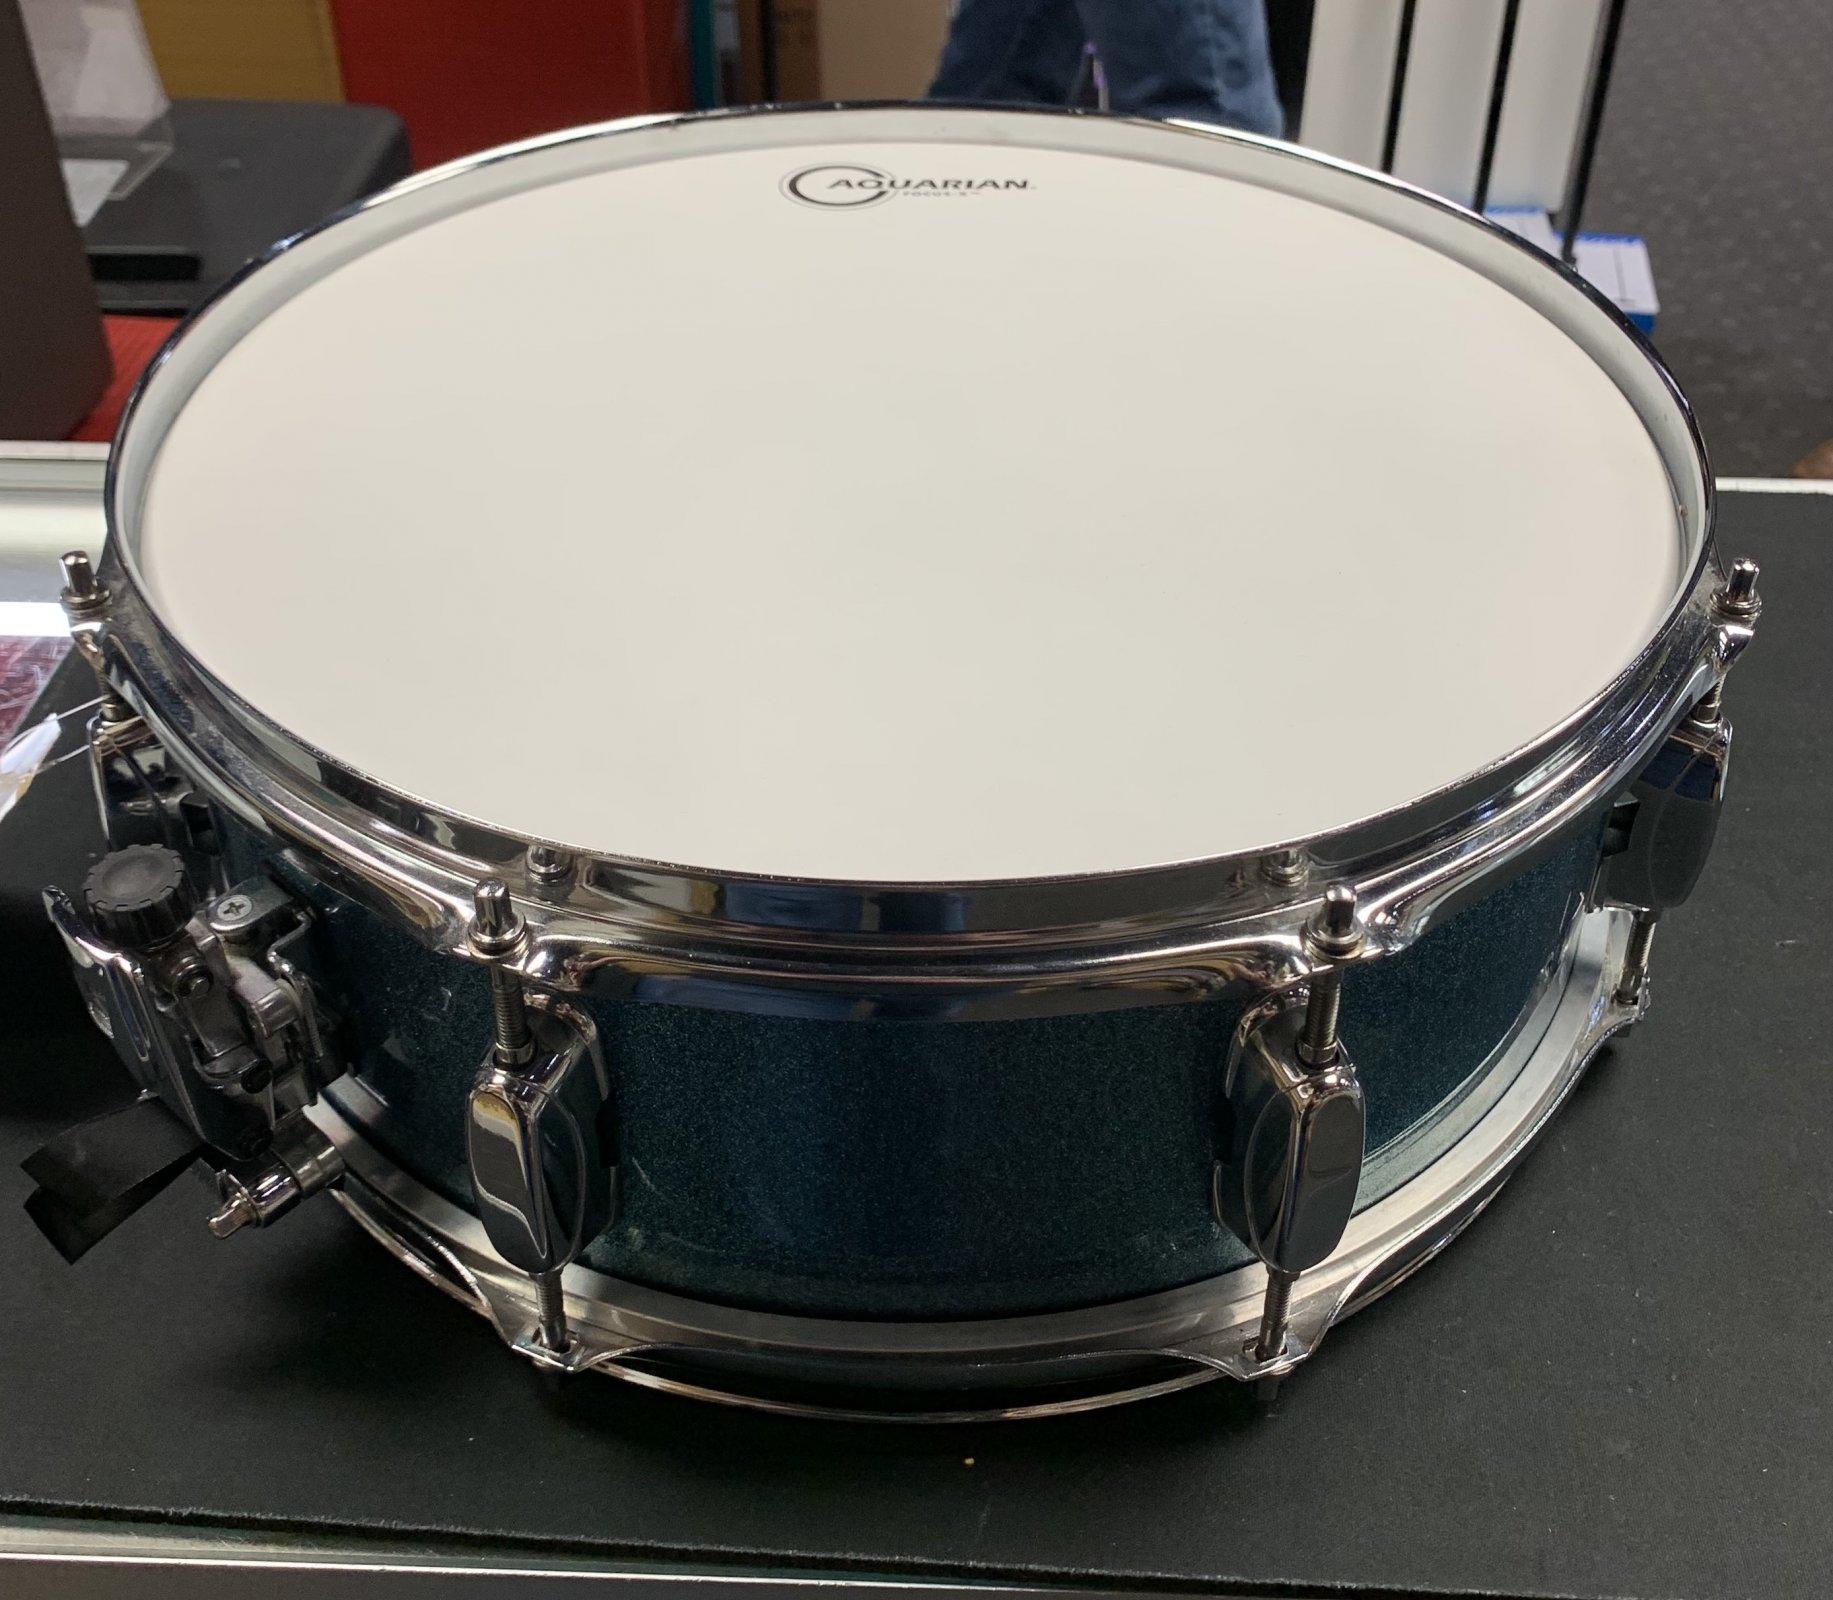 Used TAMA Silverstar All Birch Snare 5x14 - Sparkle Blue